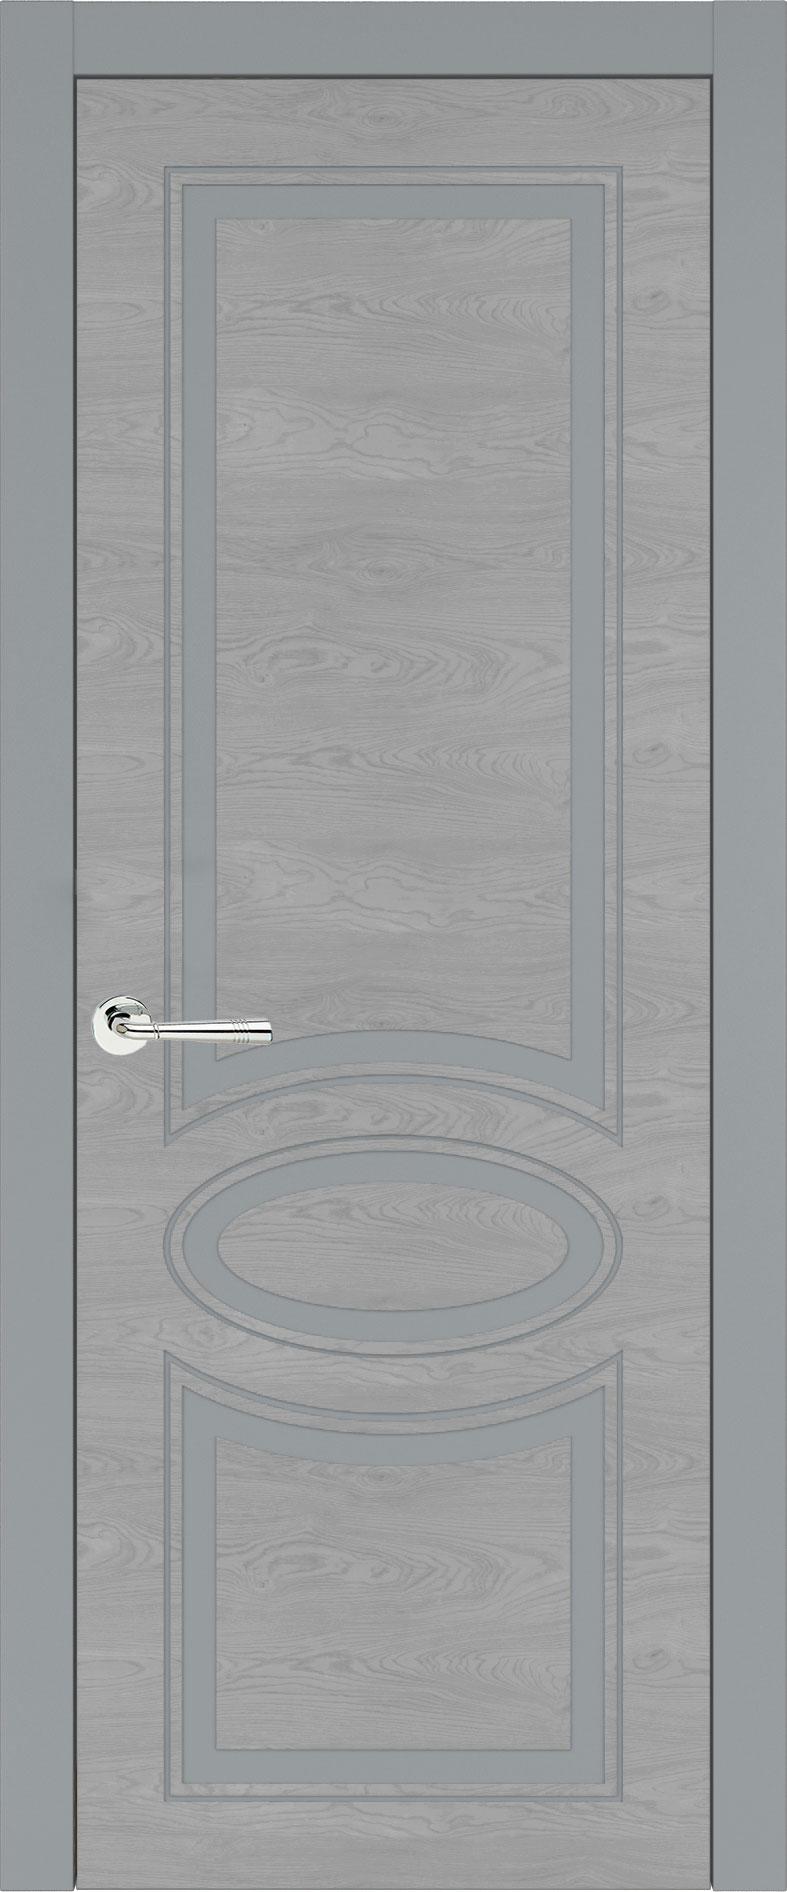 Florencia Neo Classic цвет - Серебристо-серая эмаль по шпону (RAL 7045) Без стекла (ДГ)